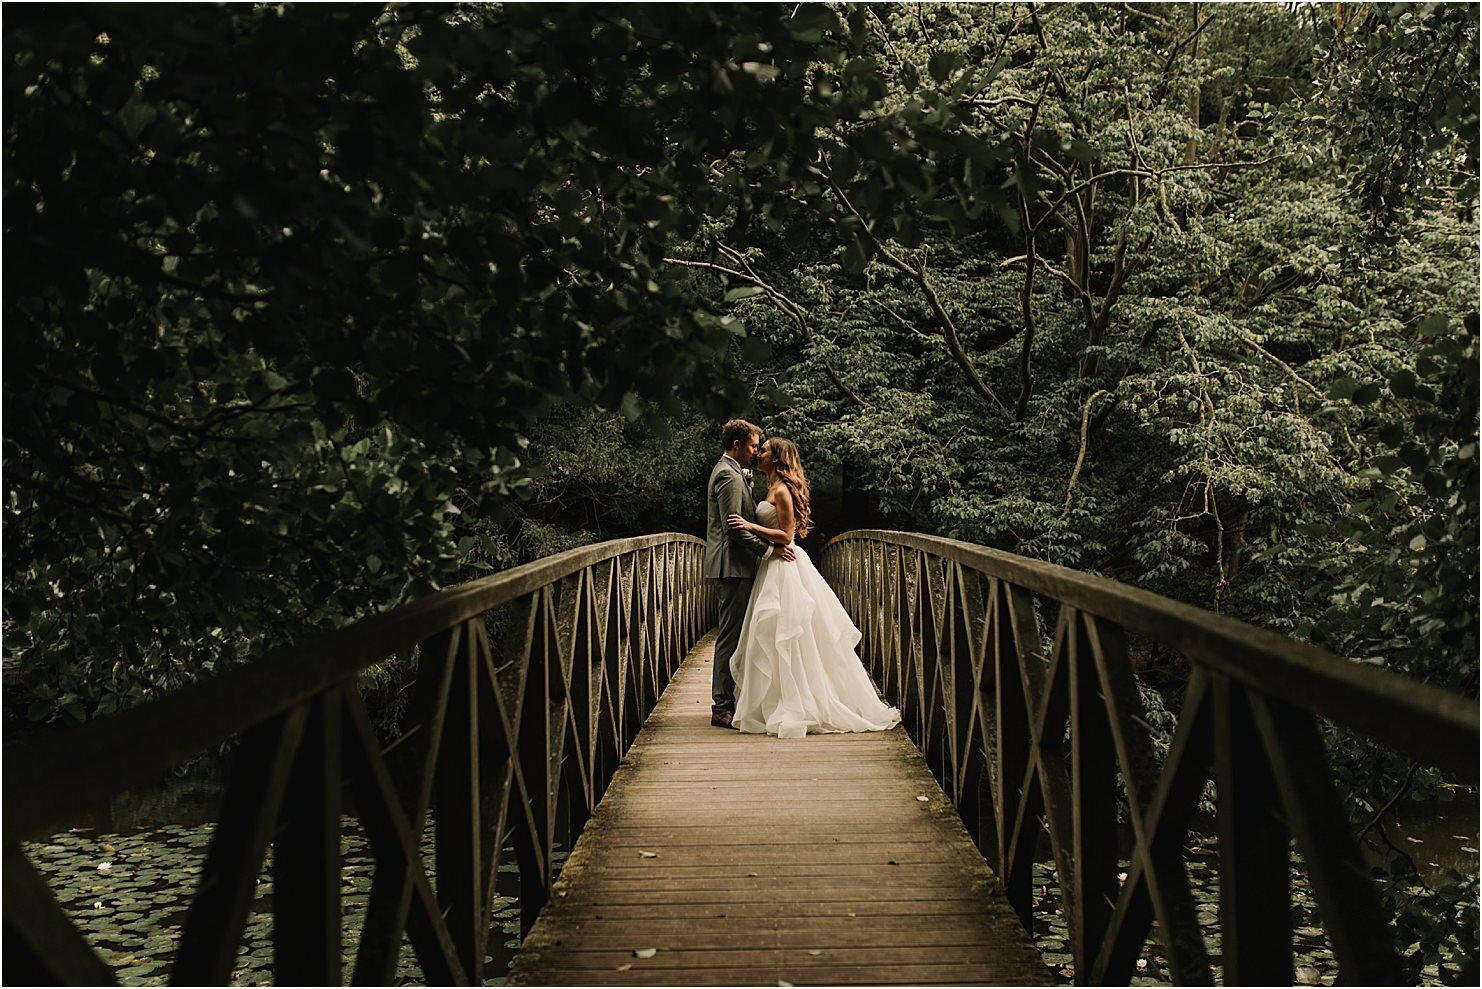 boda-de-cuento-en-castillo-boda-en-londres-69.jpg